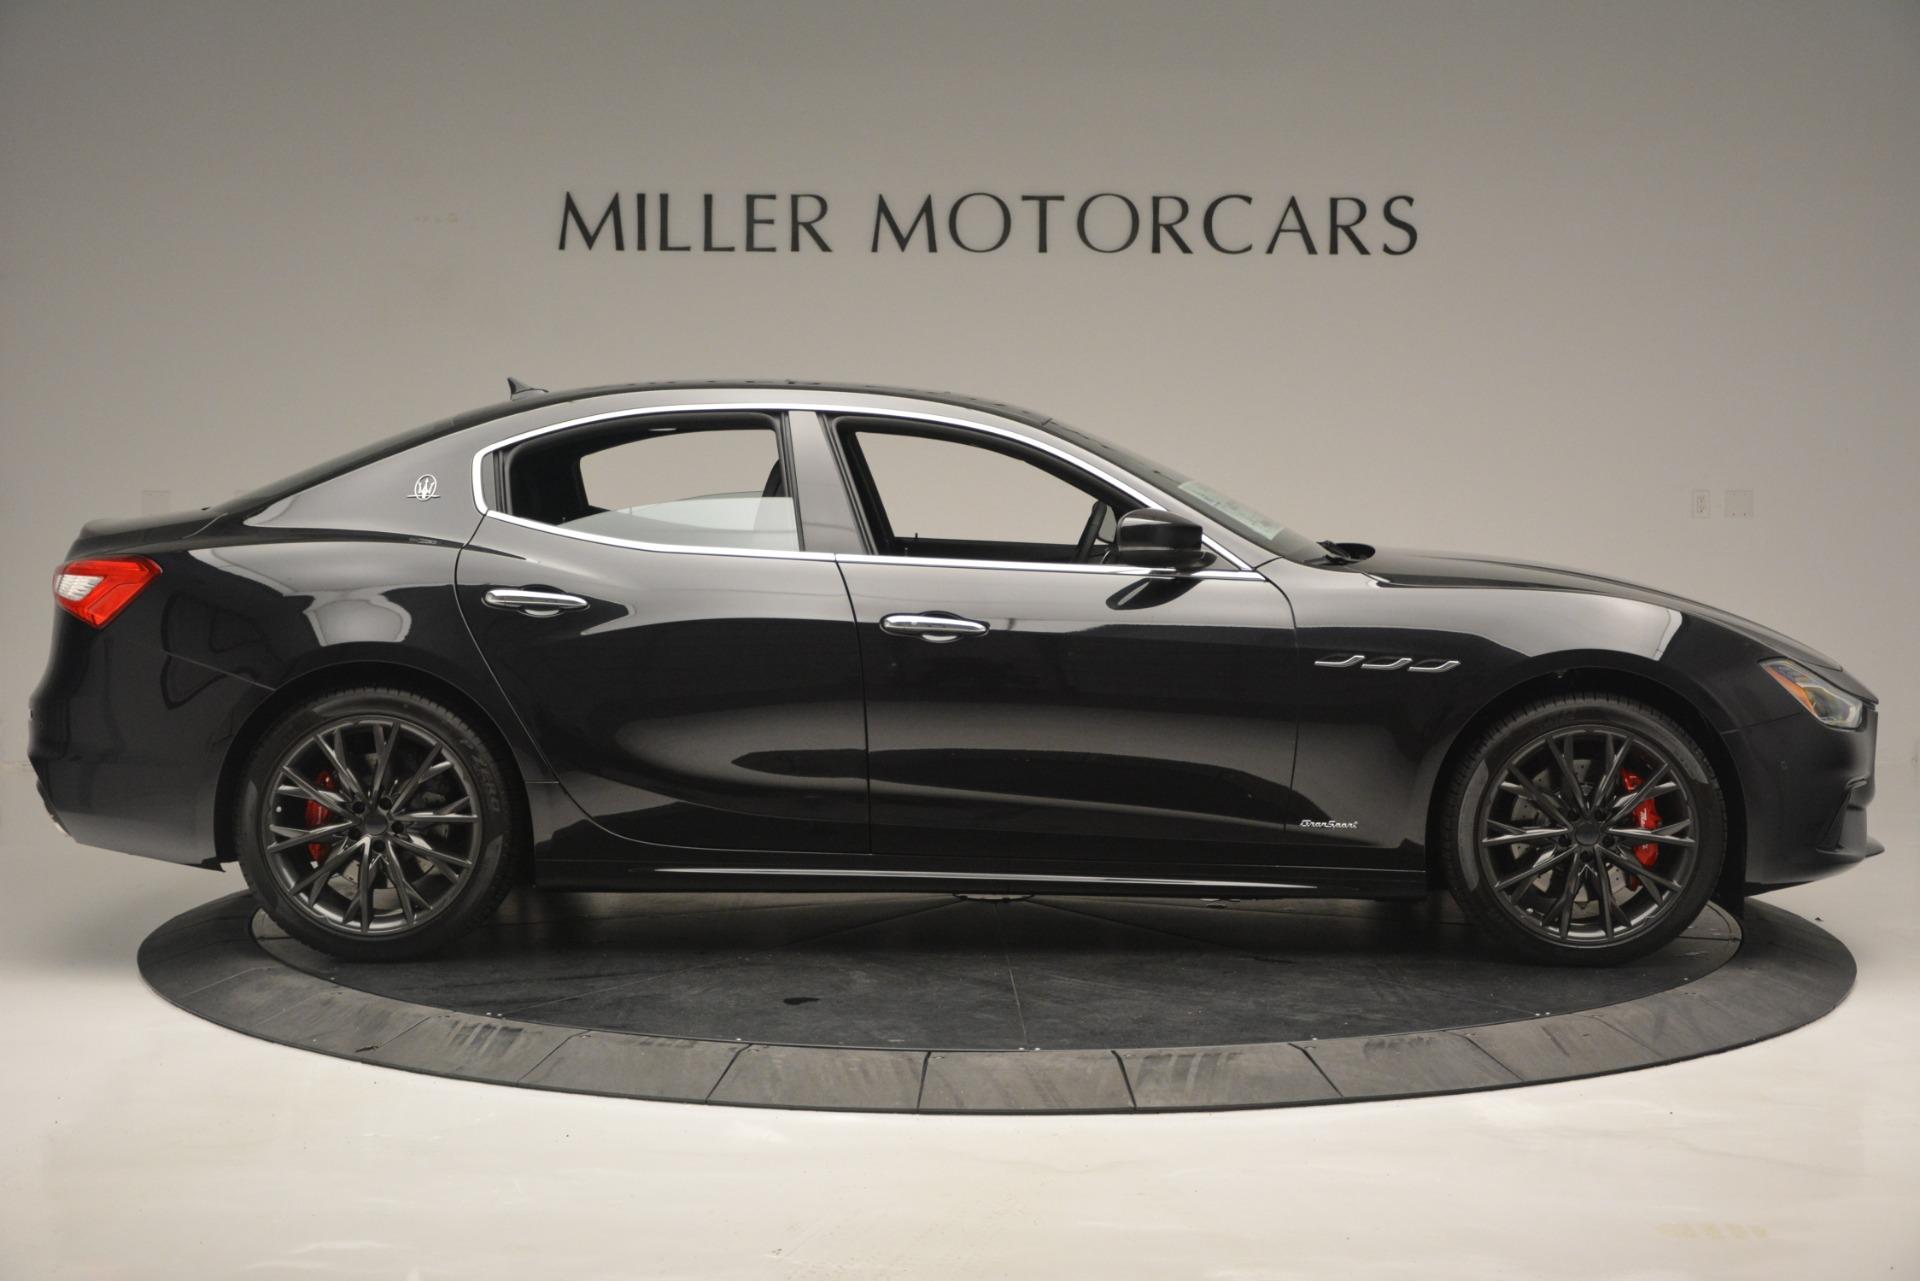 New 2019 Maserati Ghibli S Q4 GranSport For Sale In Westport, CT 2588_p9